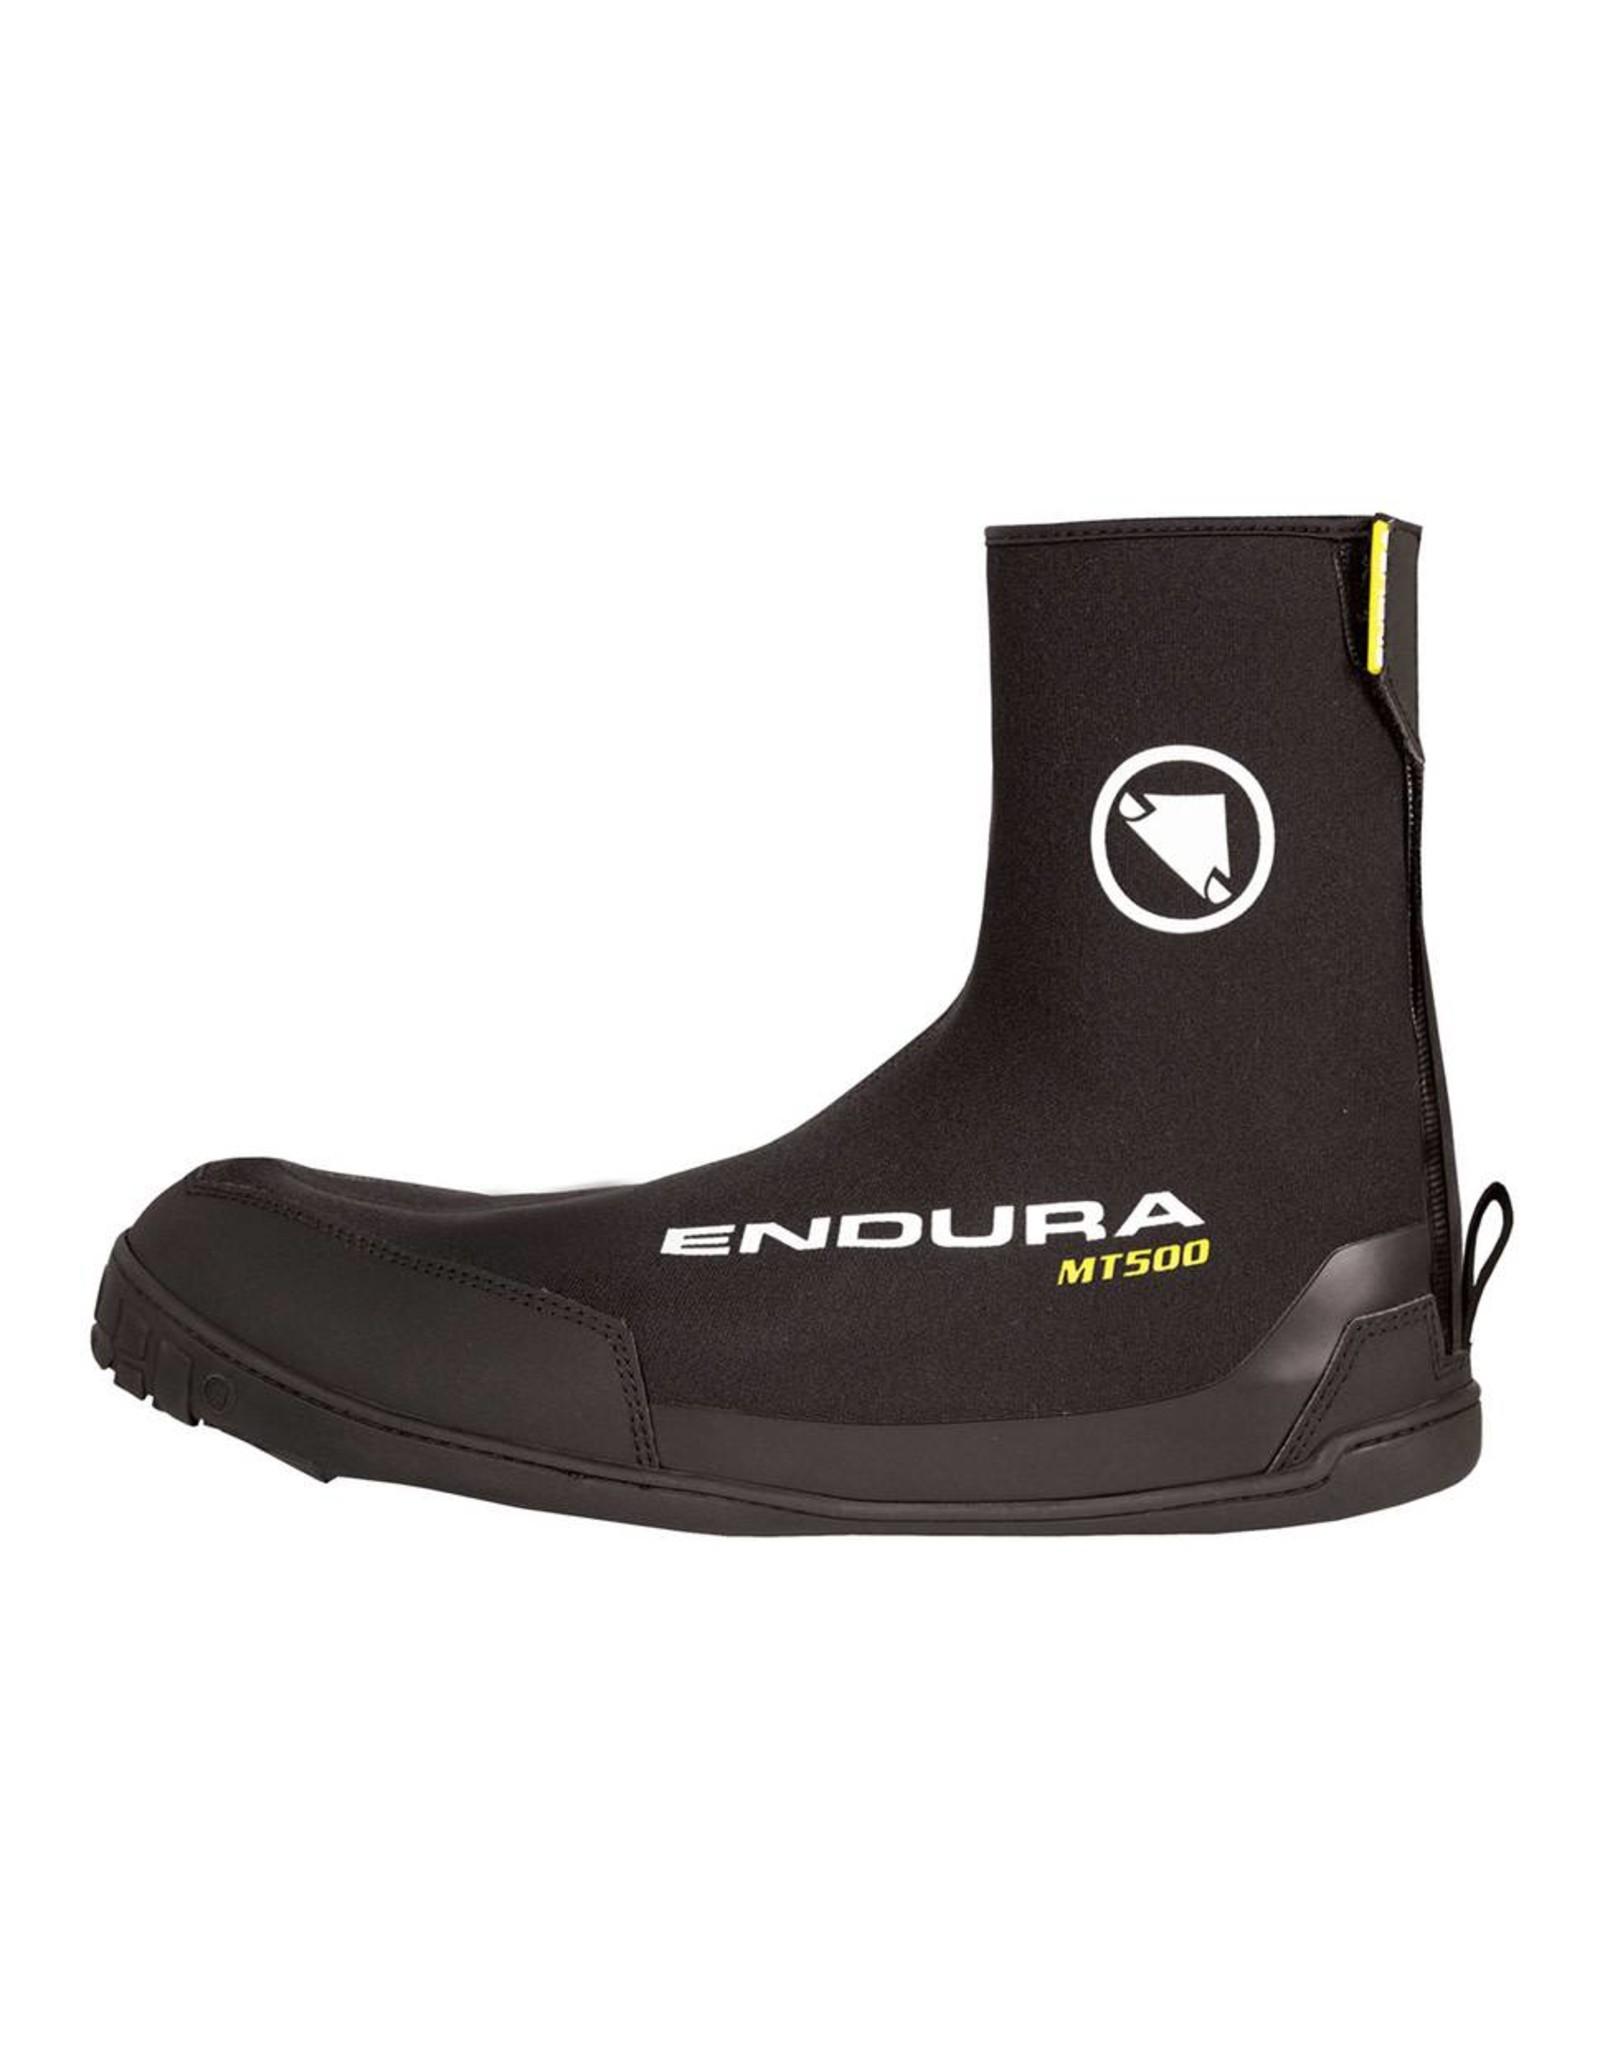 ENDURA Endura MT500 Plus Overshoe - Black - M/L